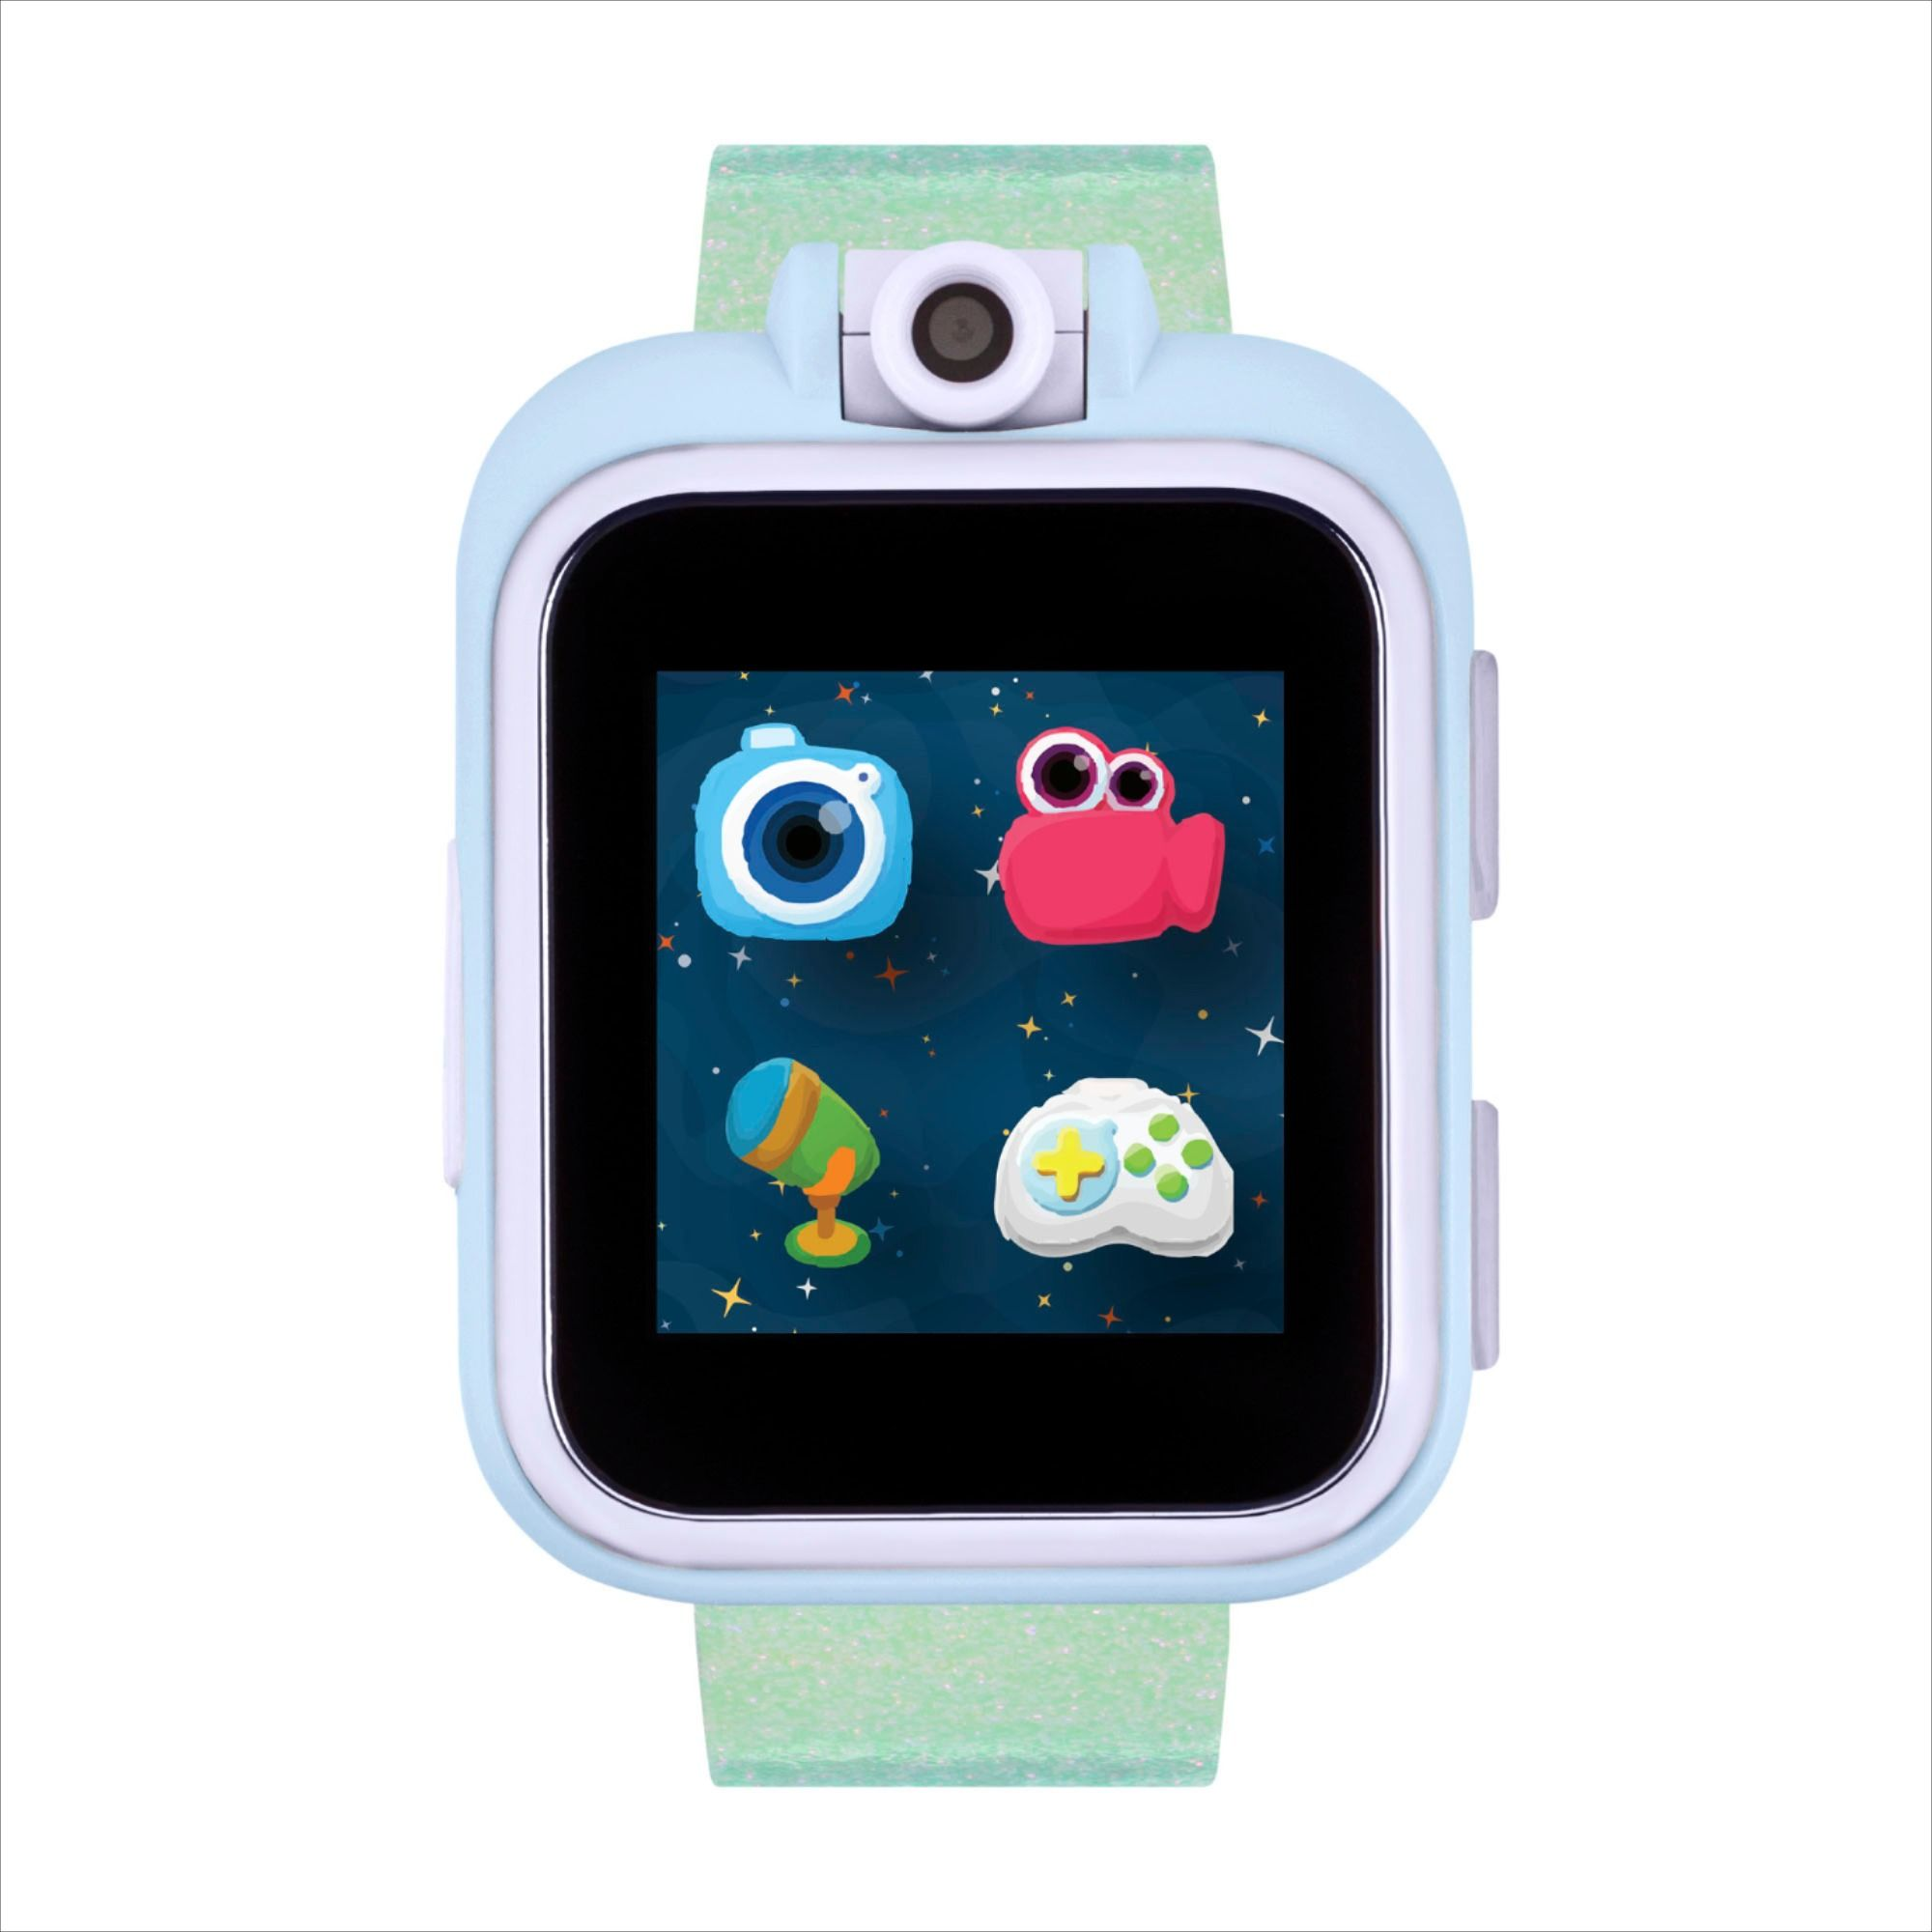 images?q=tbn:ANd9GcQh_l3eQ5xwiPy07kGEXjmjgmBKBRB7H2mRxCGhv1tFWg5c_mWT Smartwatch For Tween